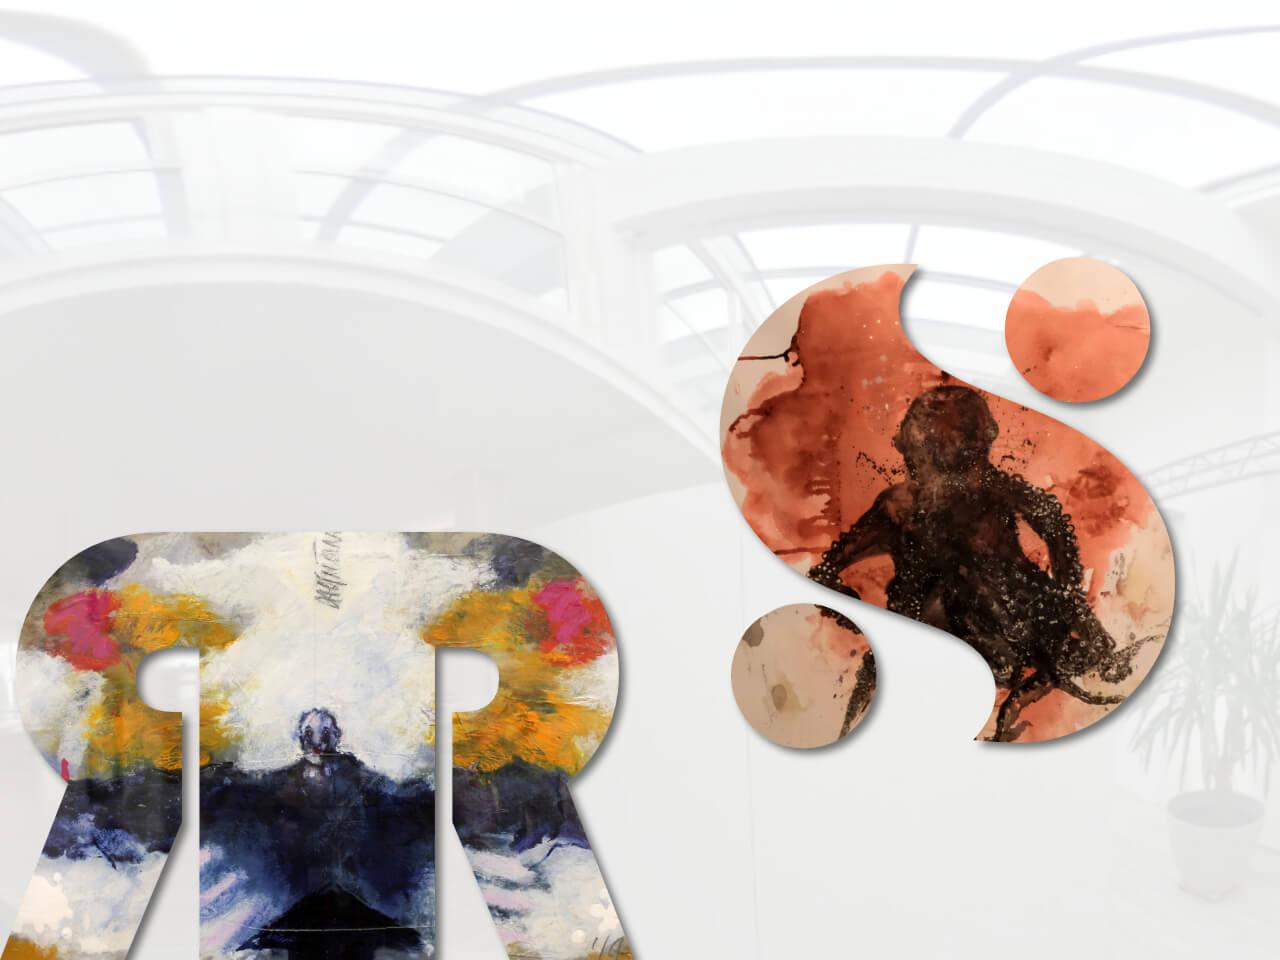 Aqua & Faces / Spiegelbilder / Turbulenzen 20.10.2021 - 13:45